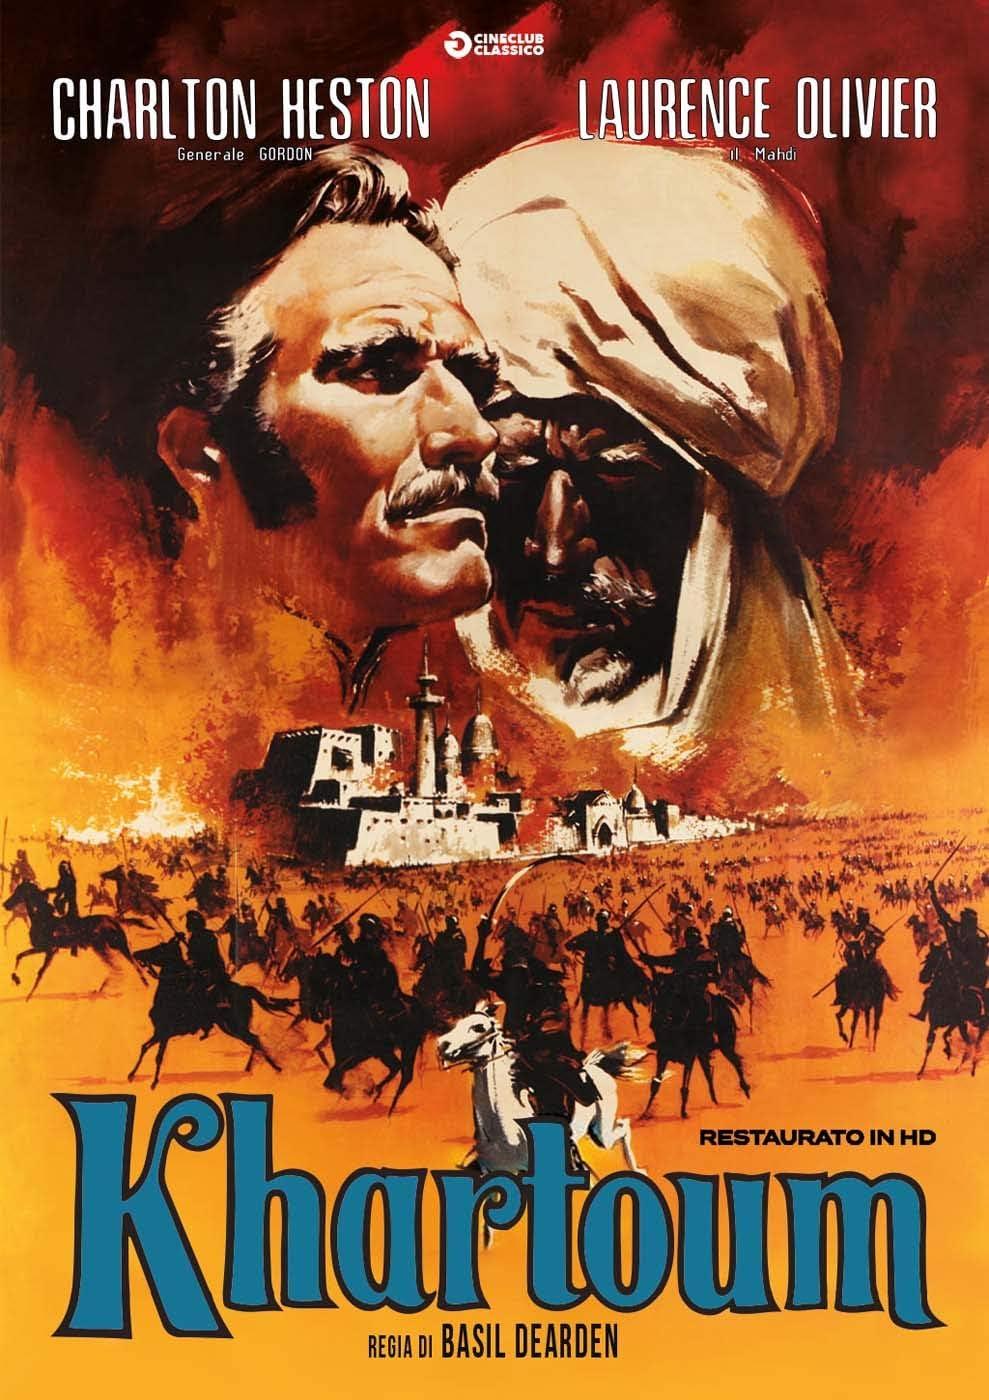 Khartoum [DVD] (IMPORT) (No English version): Amazon.co.uk: DVD & Blu-ray